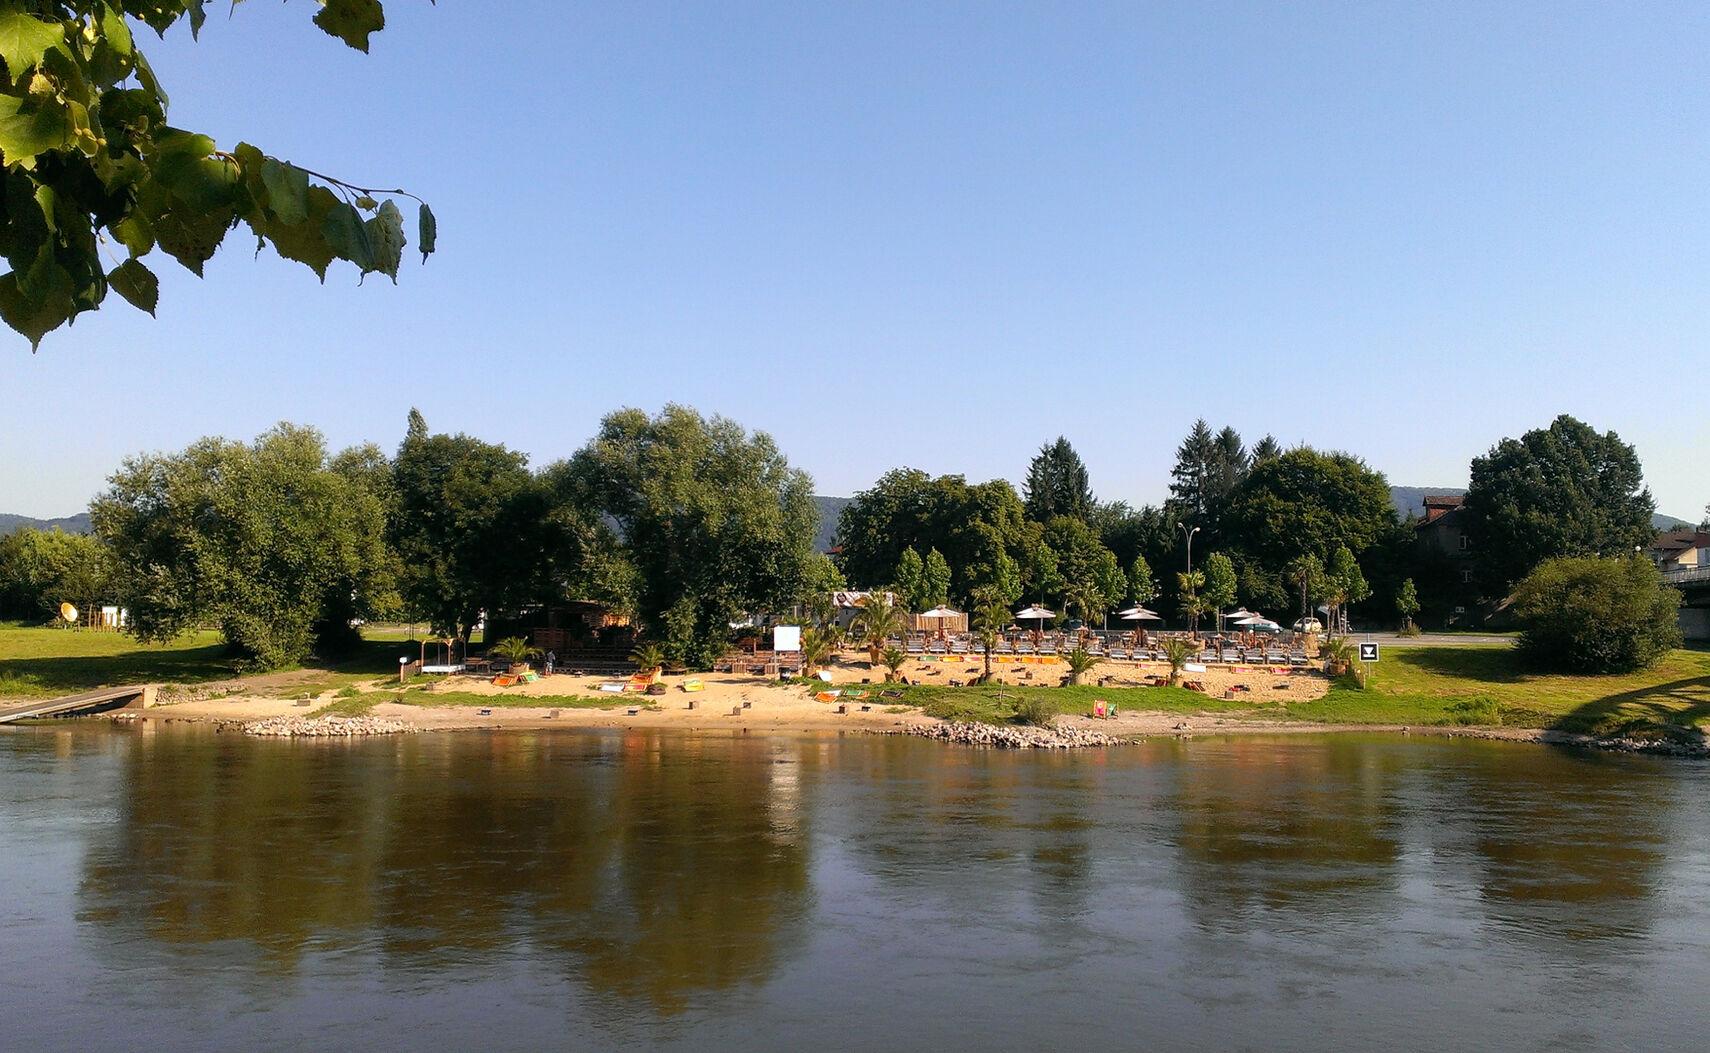 Weserbeach